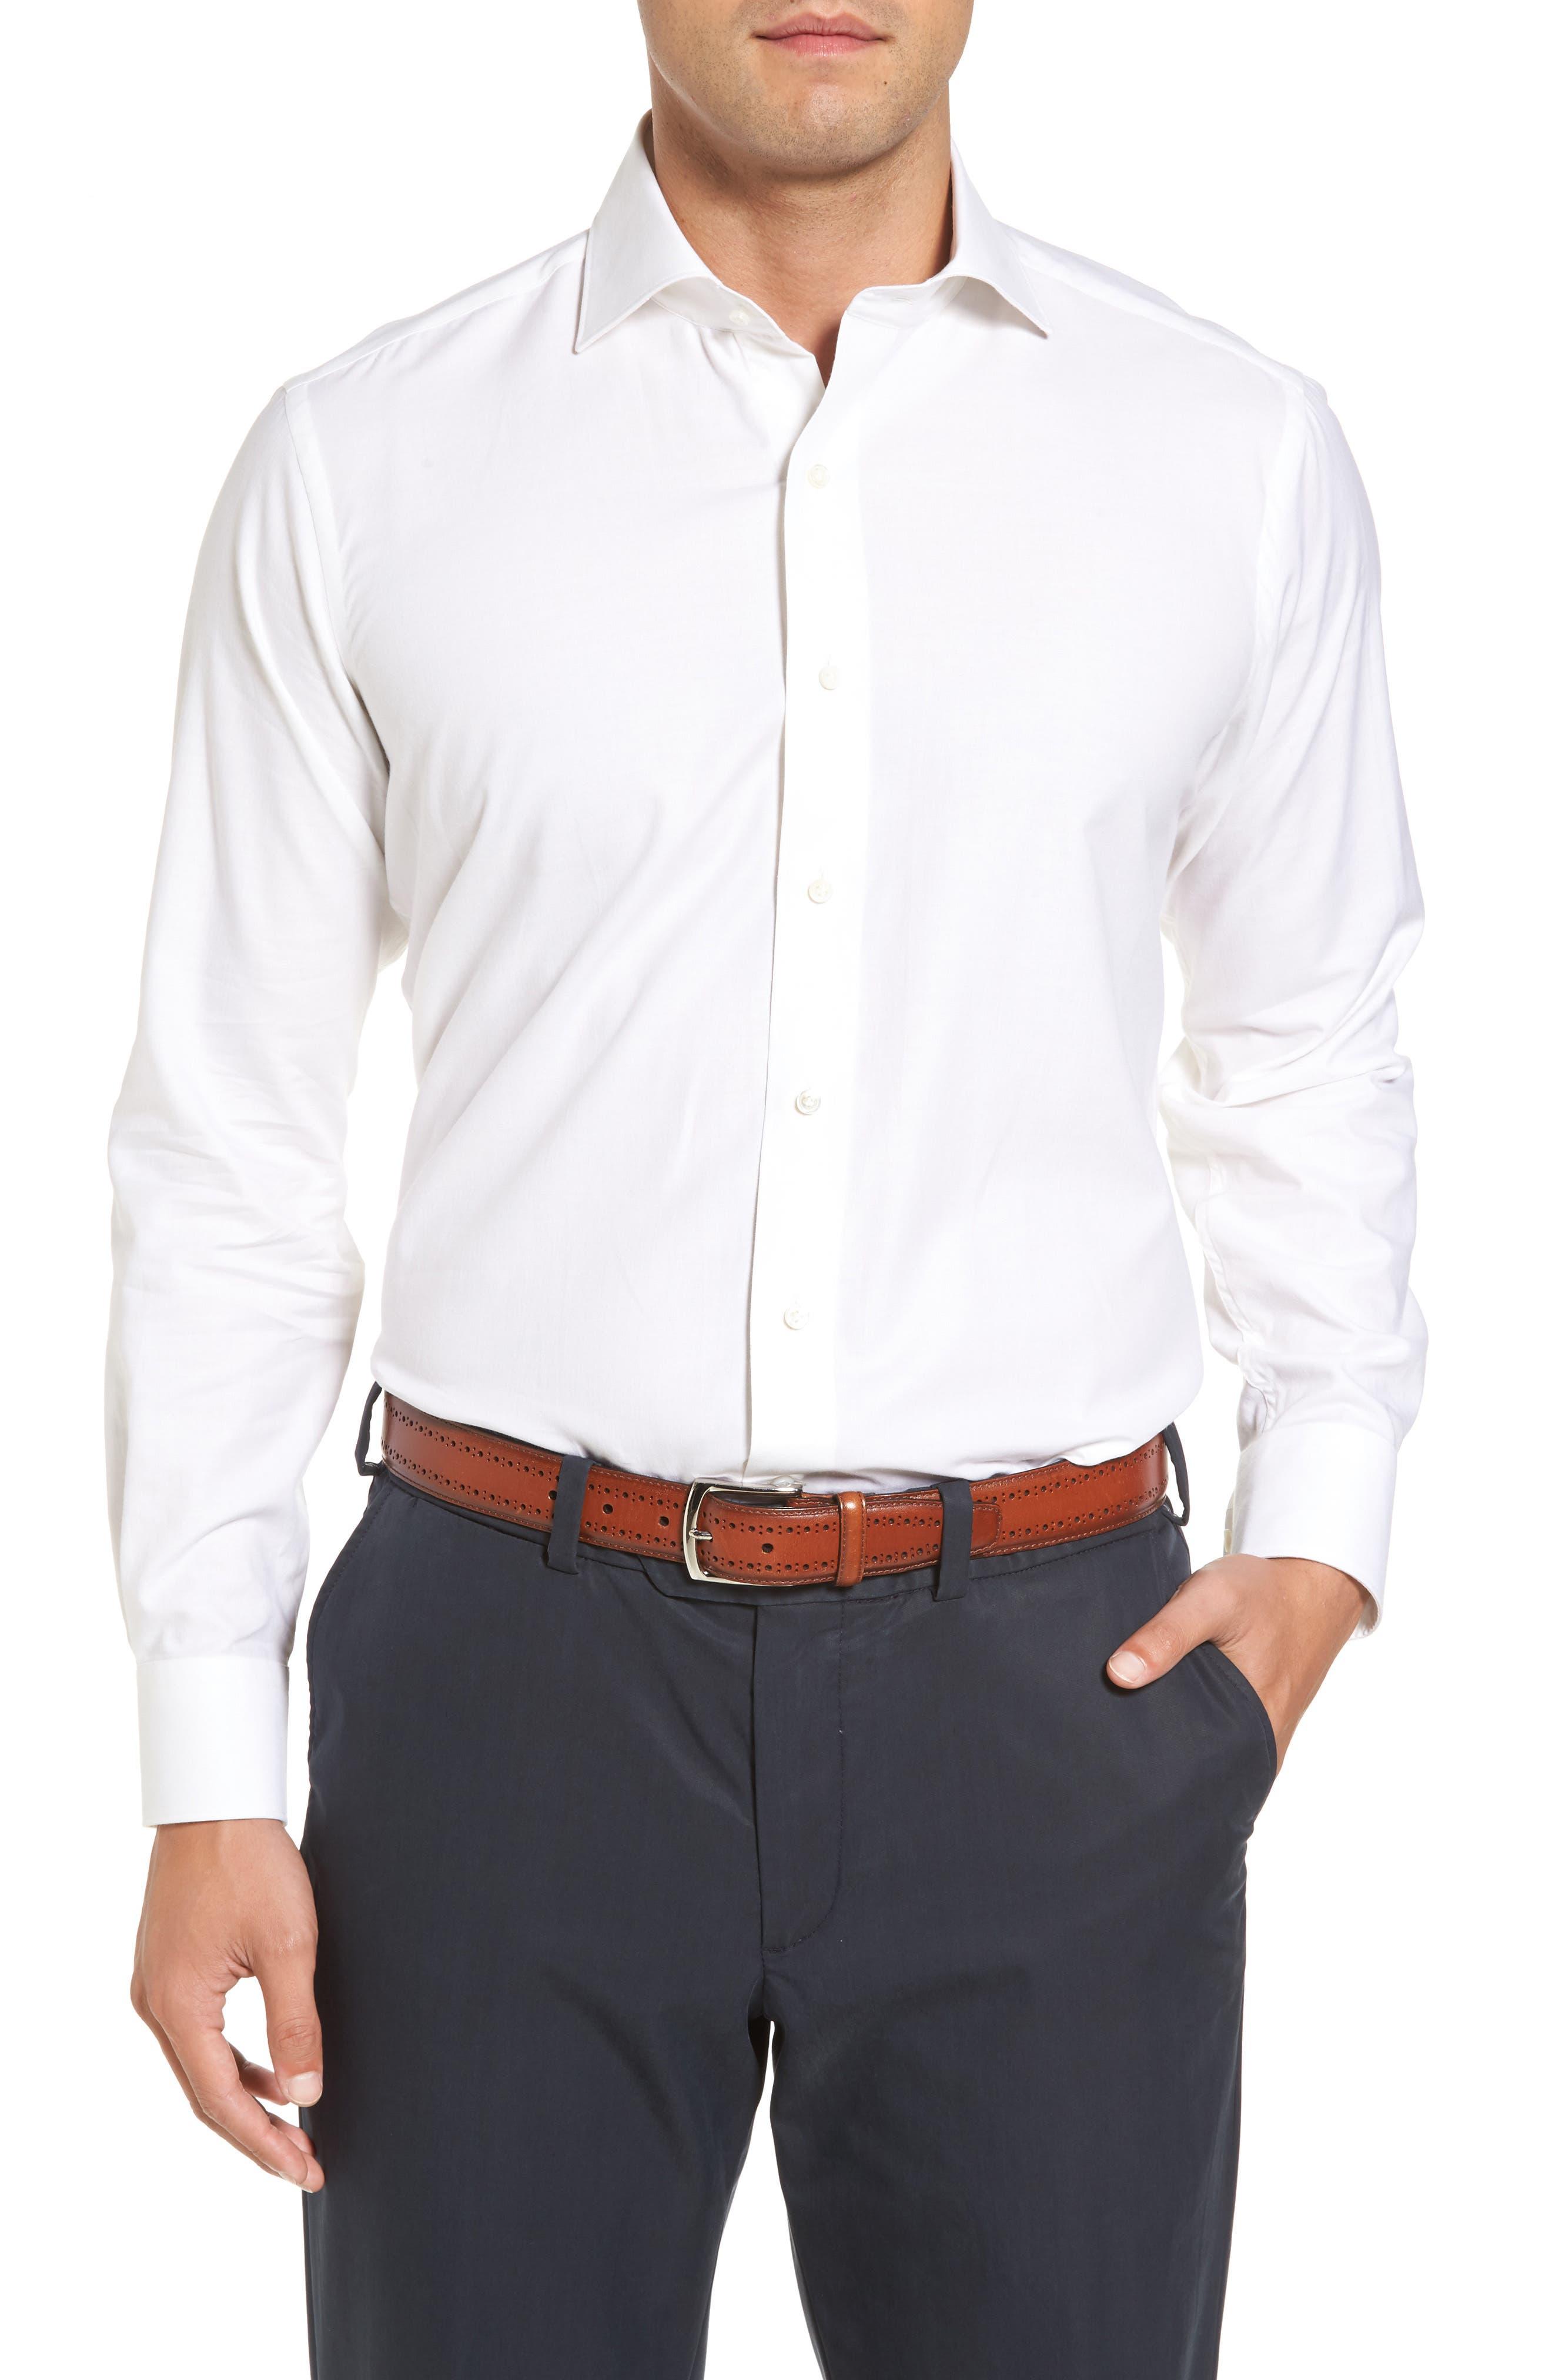 Peter Millar Silky Touch Herringbone Sport Shirt